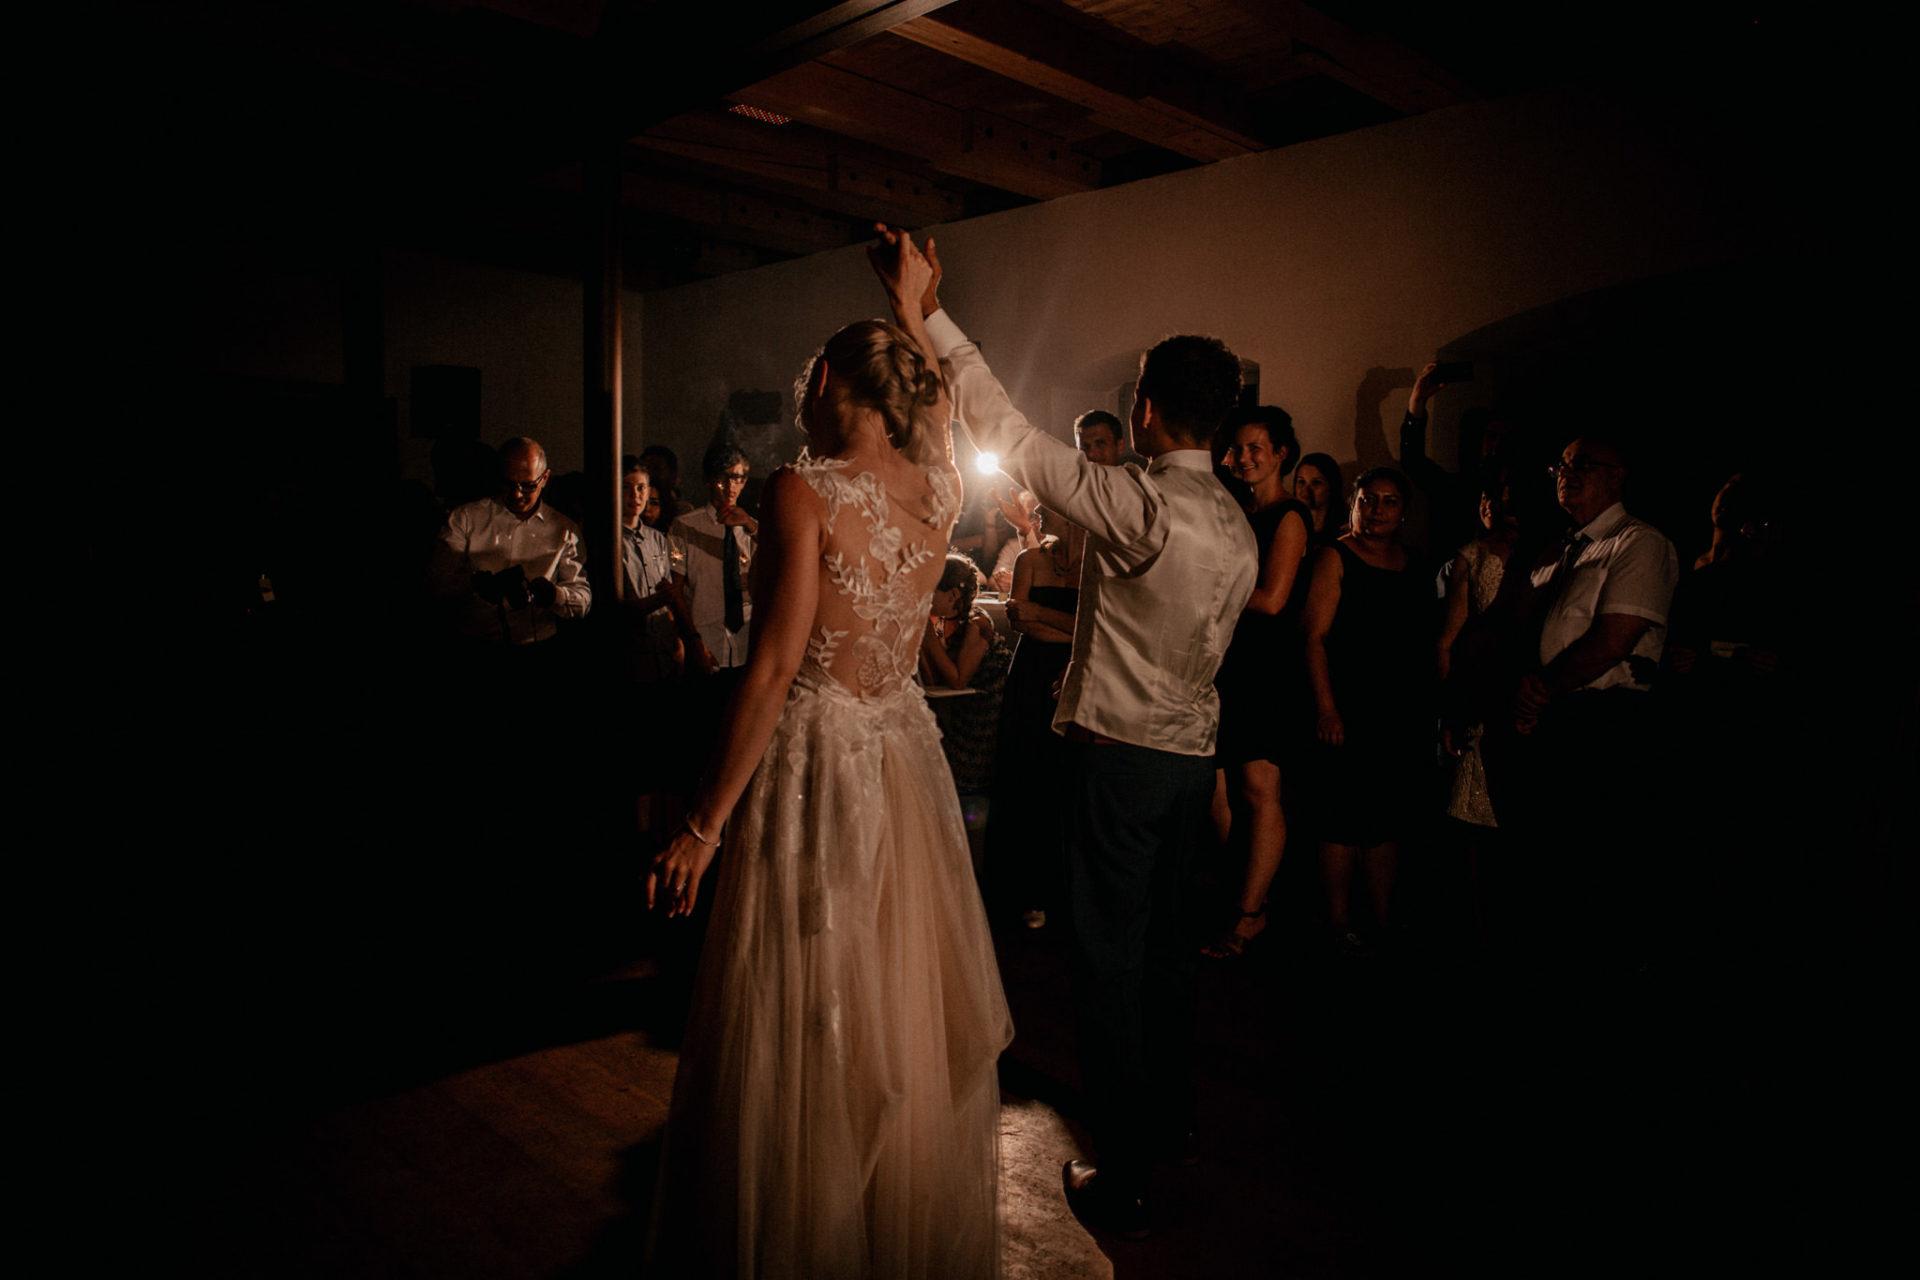 wedding photographer suttgart-reception water castle Erkenbrechtshausen Crailsheim-first look bride and groom-party-first dance